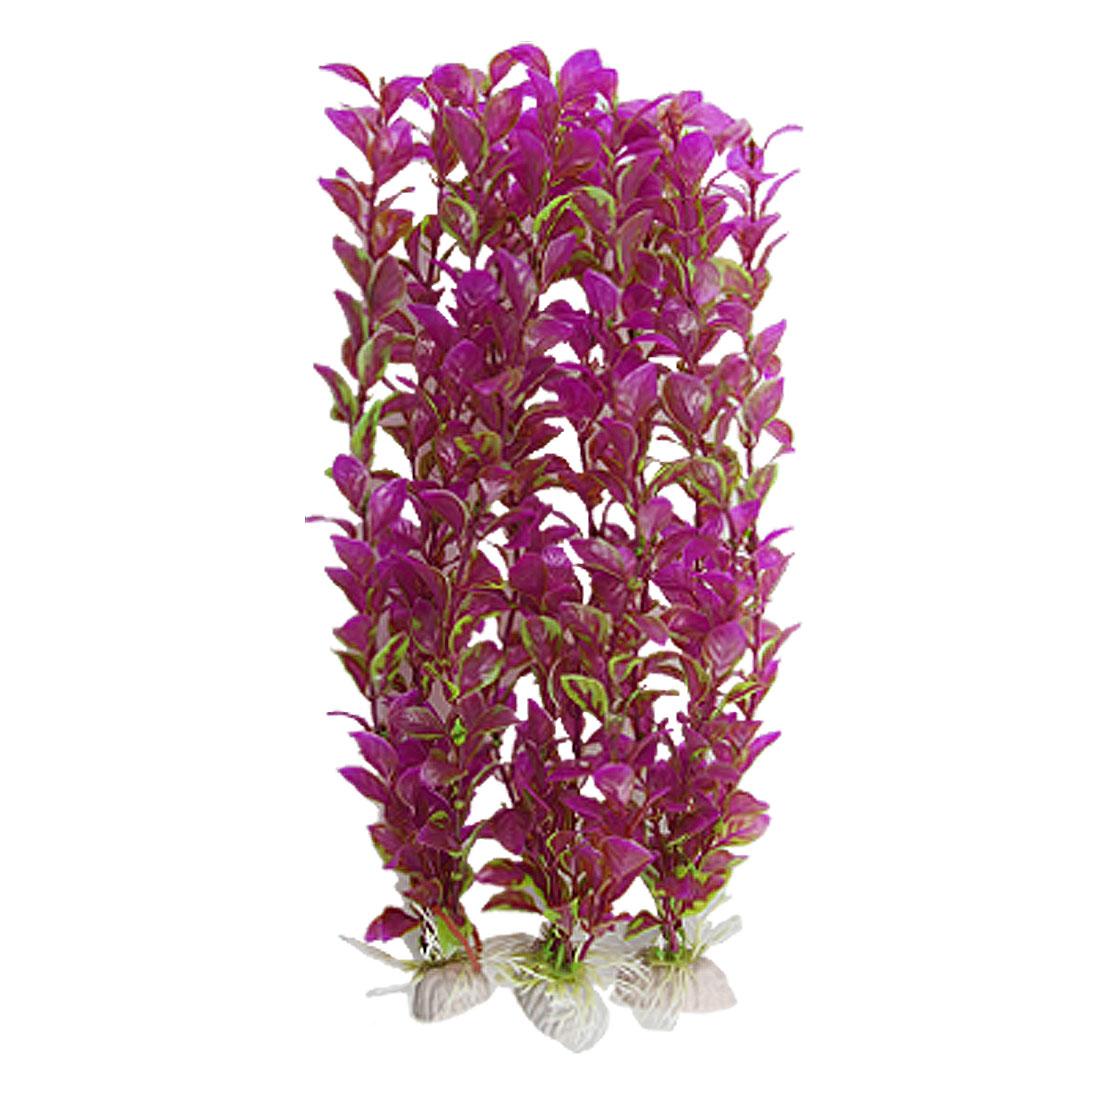 3 Pcs 32cm Fuchsia Green Plastic Oval Leaf Plant for Aquarium